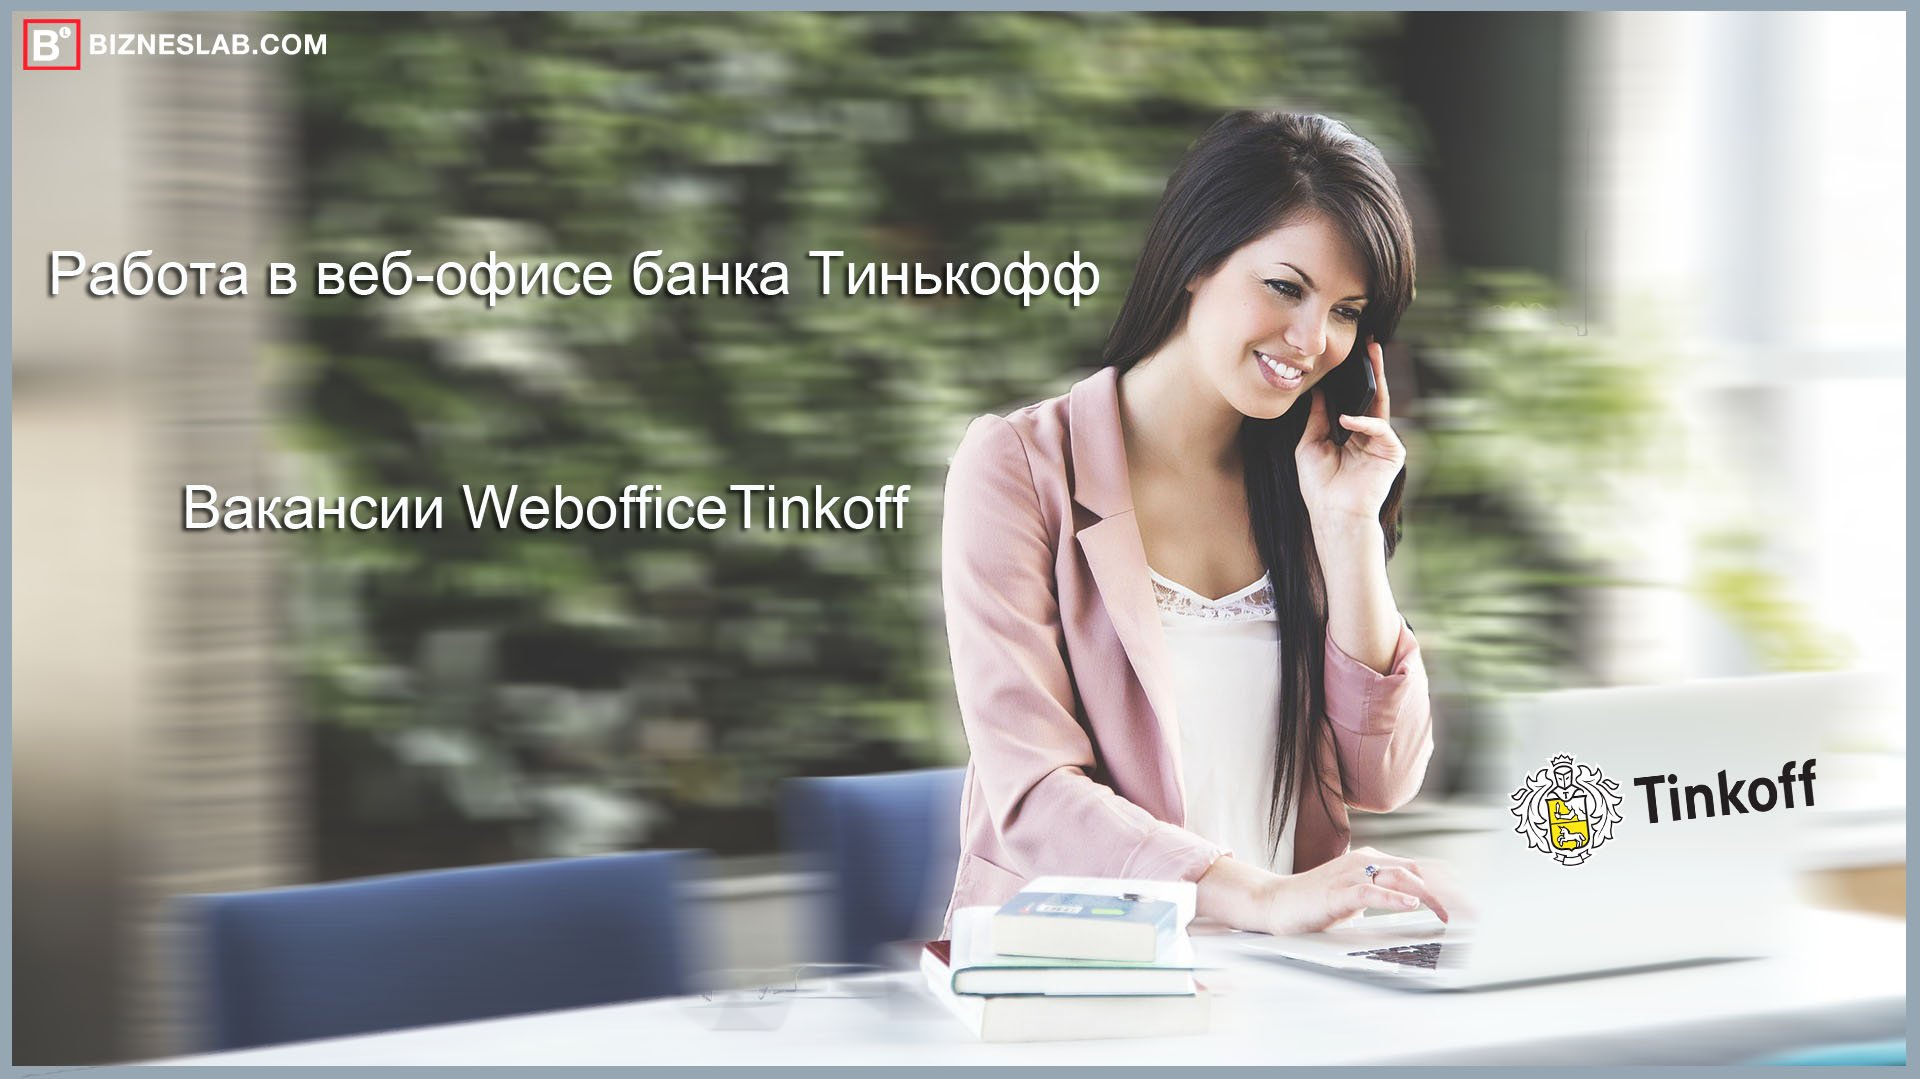 Веб офис Тинькофф